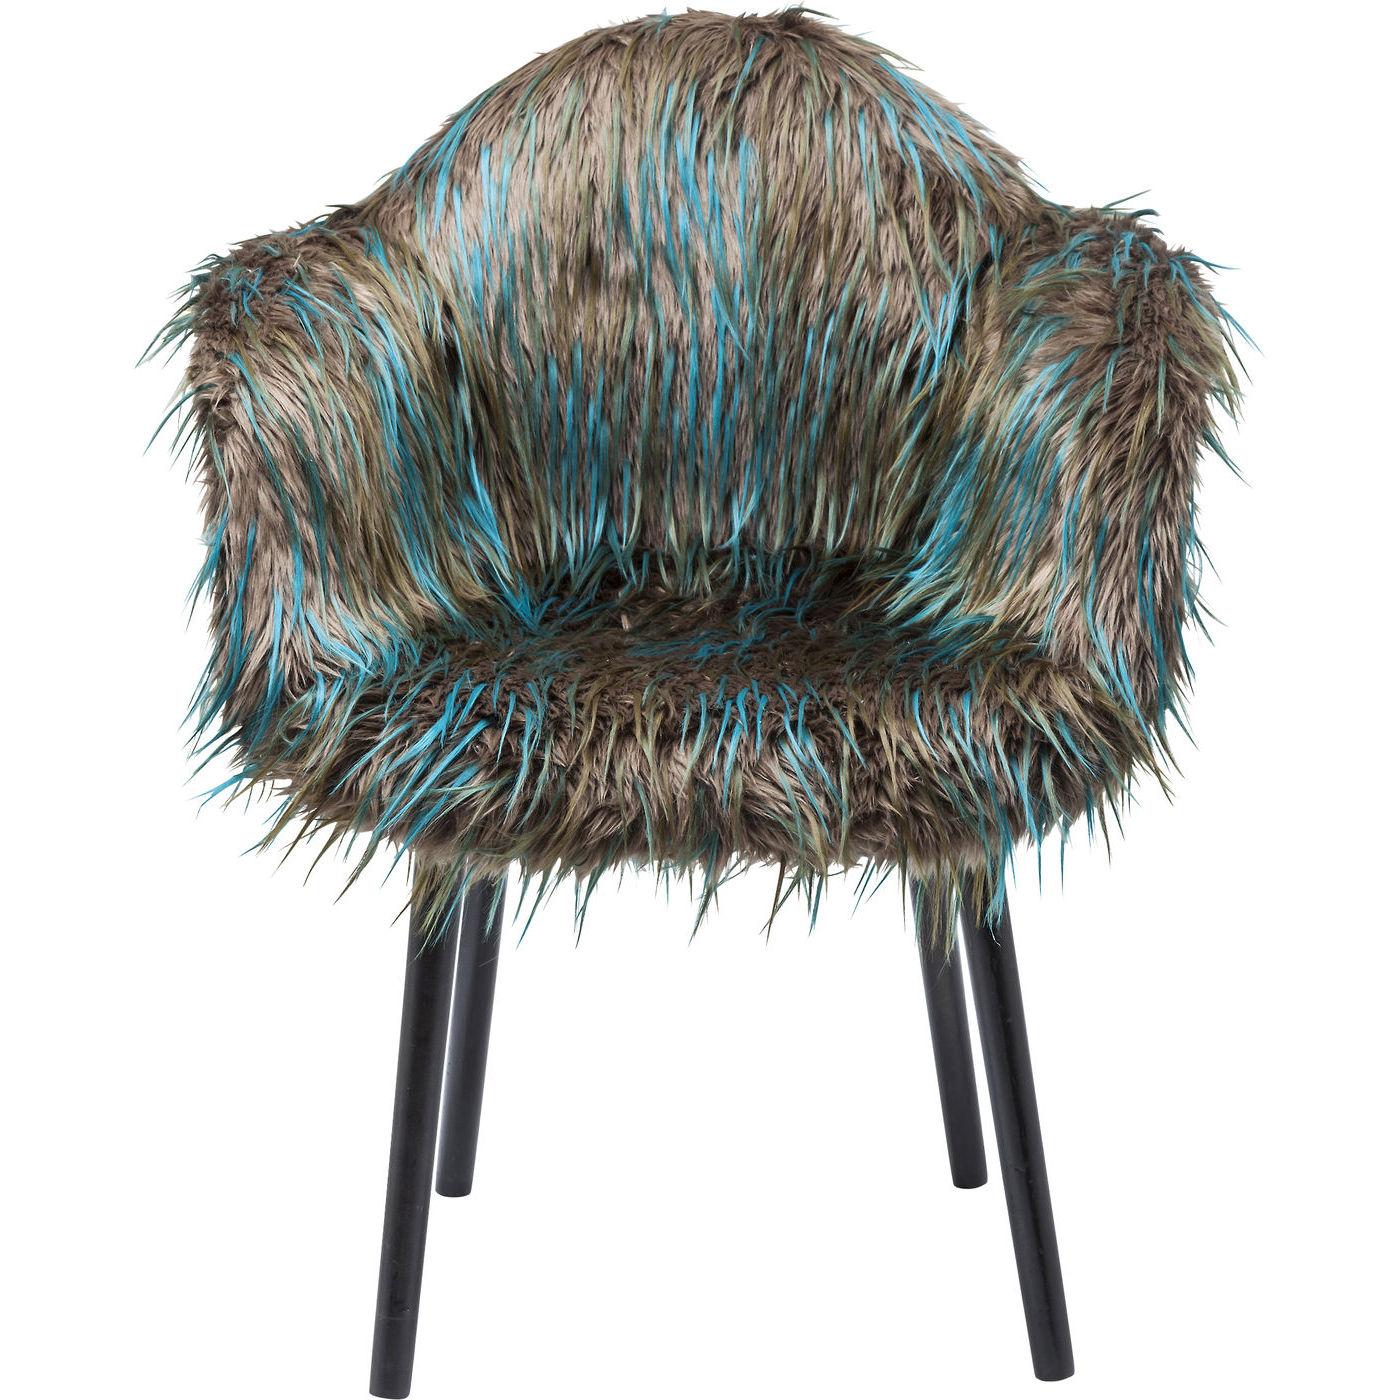 moebel stuehle wohnzimmerstuehle polsterstuehle b2b trade. Black Bedroom Furniture Sets. Home Design Ideas